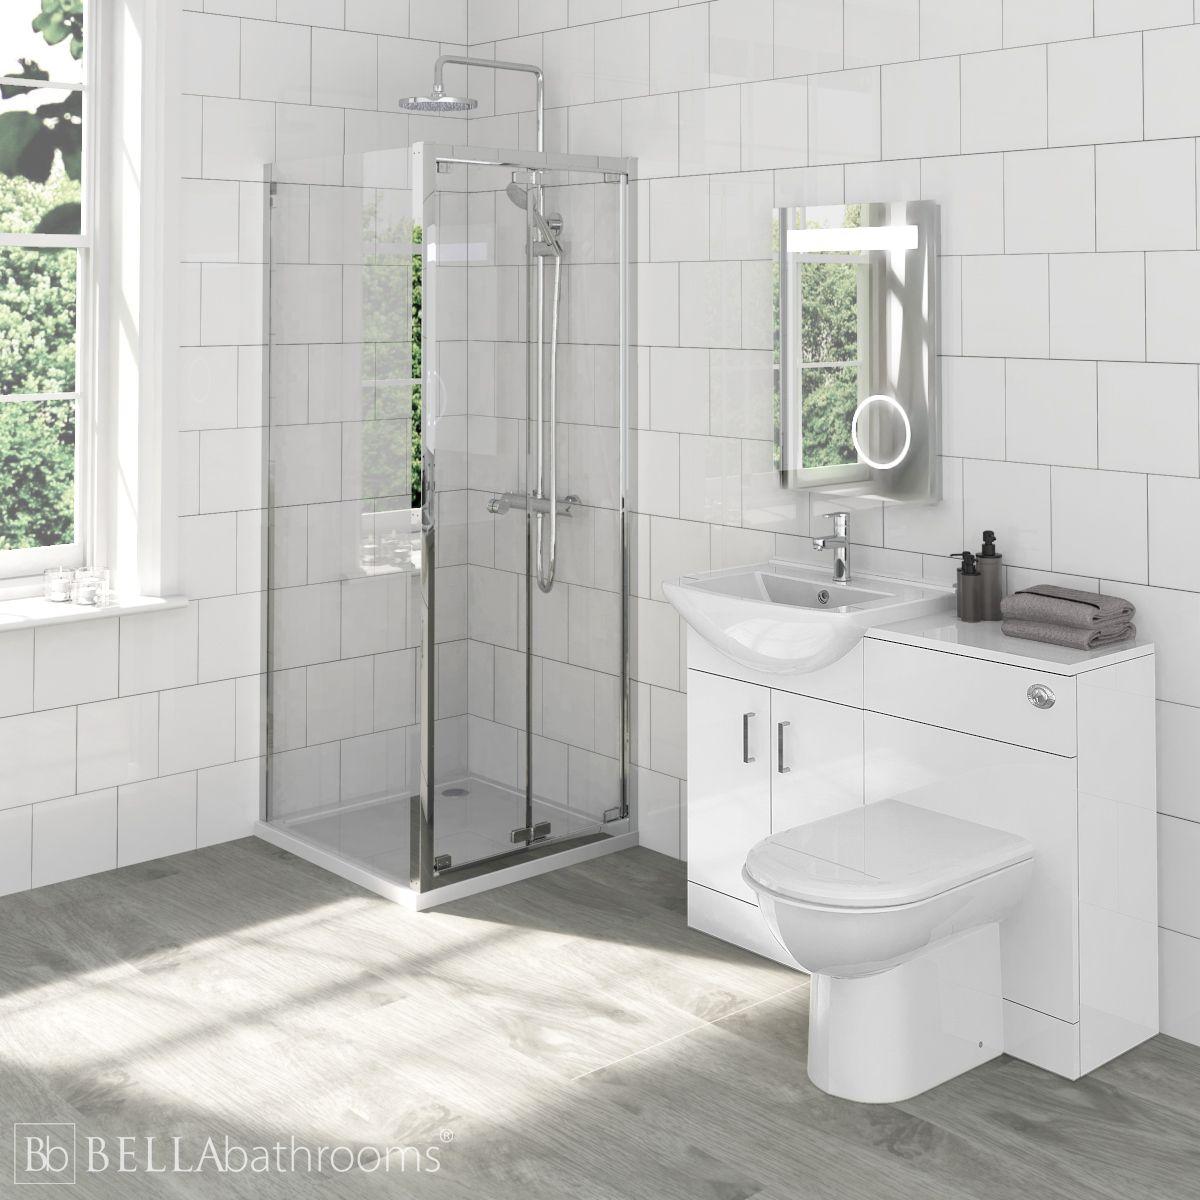 Madison Bathroom Furniture Pack with Ella Bi-Fold Shower Enclosure